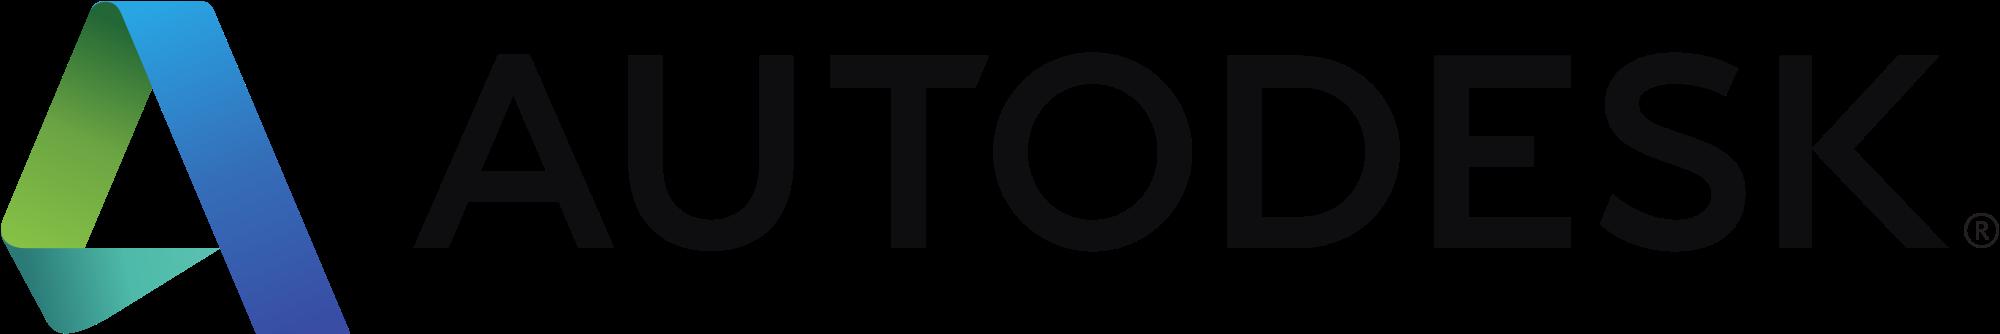 AutoCAD Map 3D logo